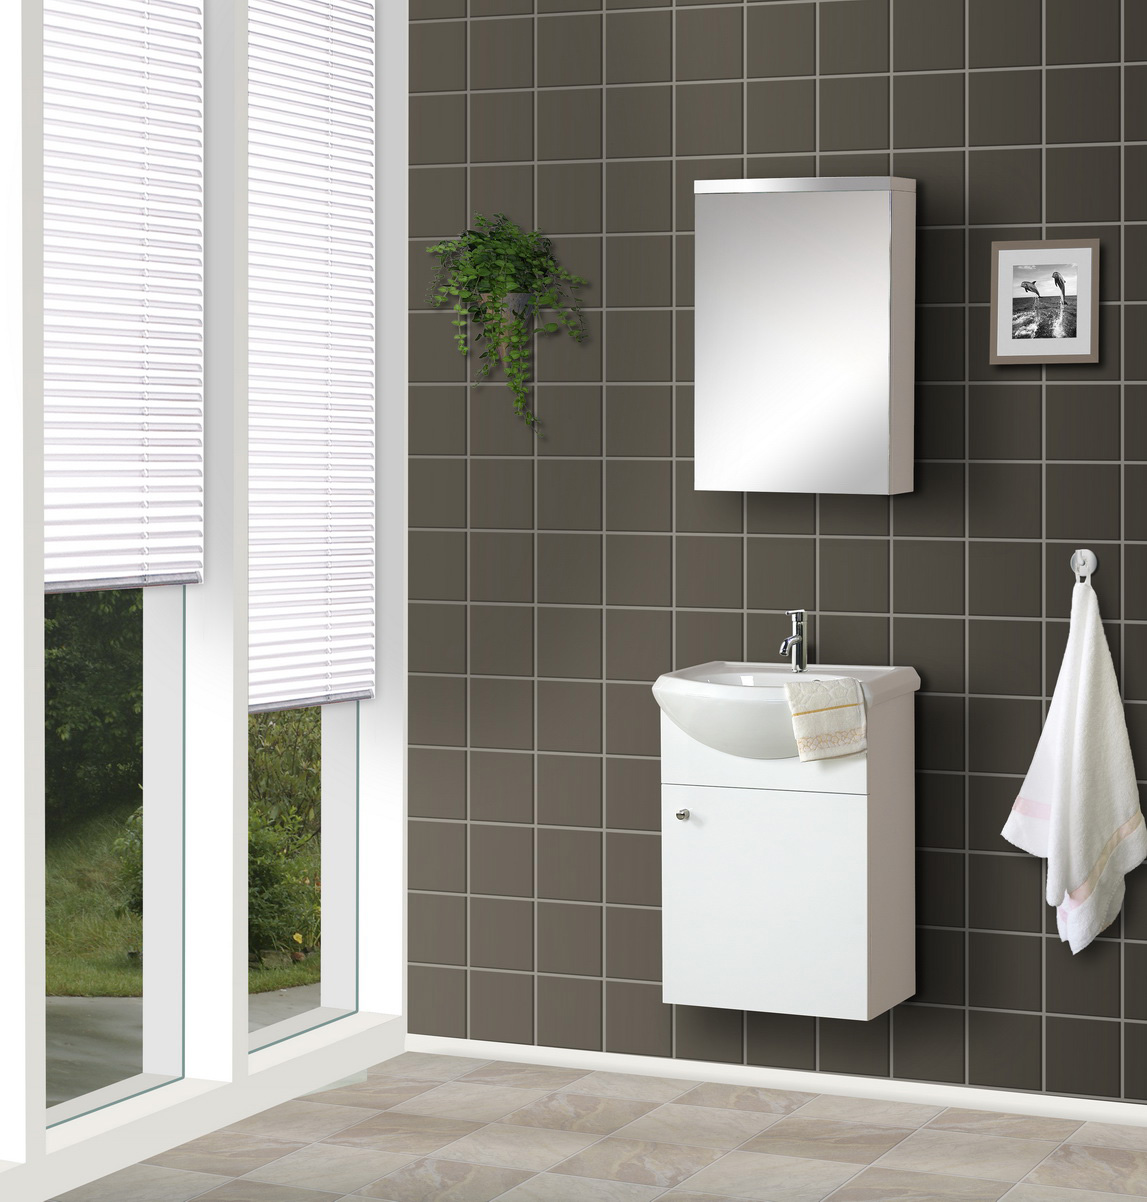 Bathroom with a ceramic sink vanity